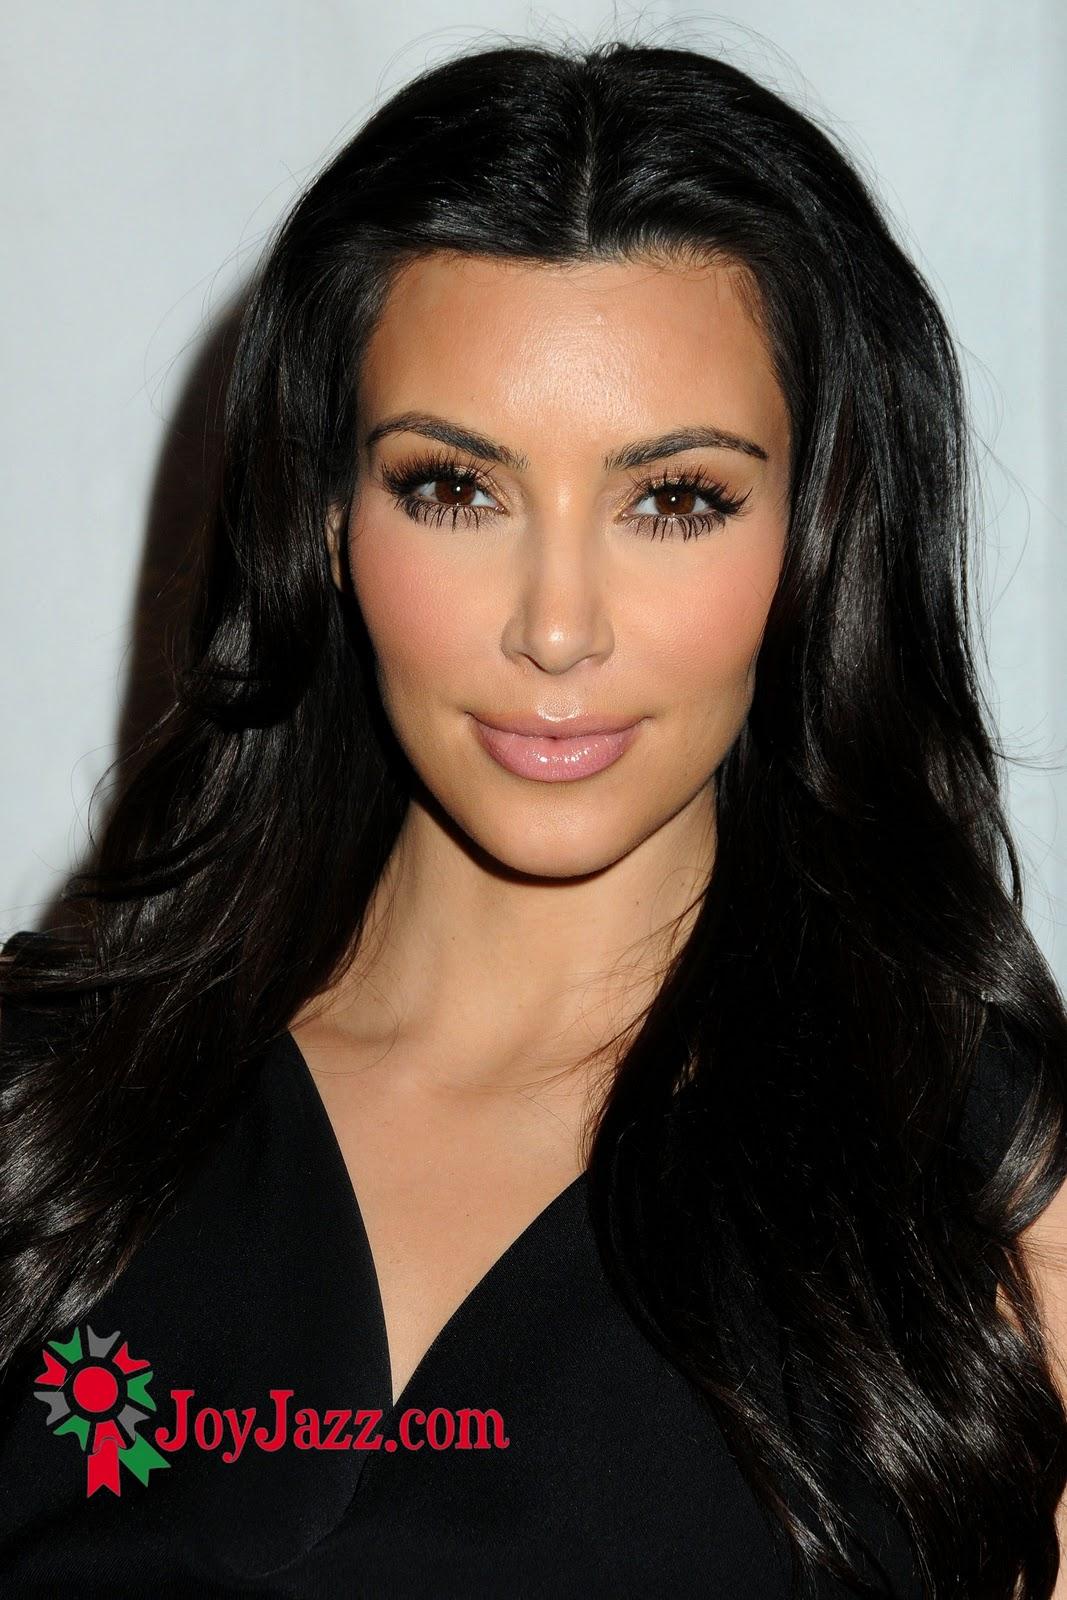 http://4.bp.blogspot.com/_0LdSrYkvVVk/TO60zw5SbzI/AAAAAAAAA3E/ymah6kw9SZg/s1600/XYFE82E6X9_Kim_Kardashian_My_Friends_Place_Charity_Clothing_Drive005.jpg